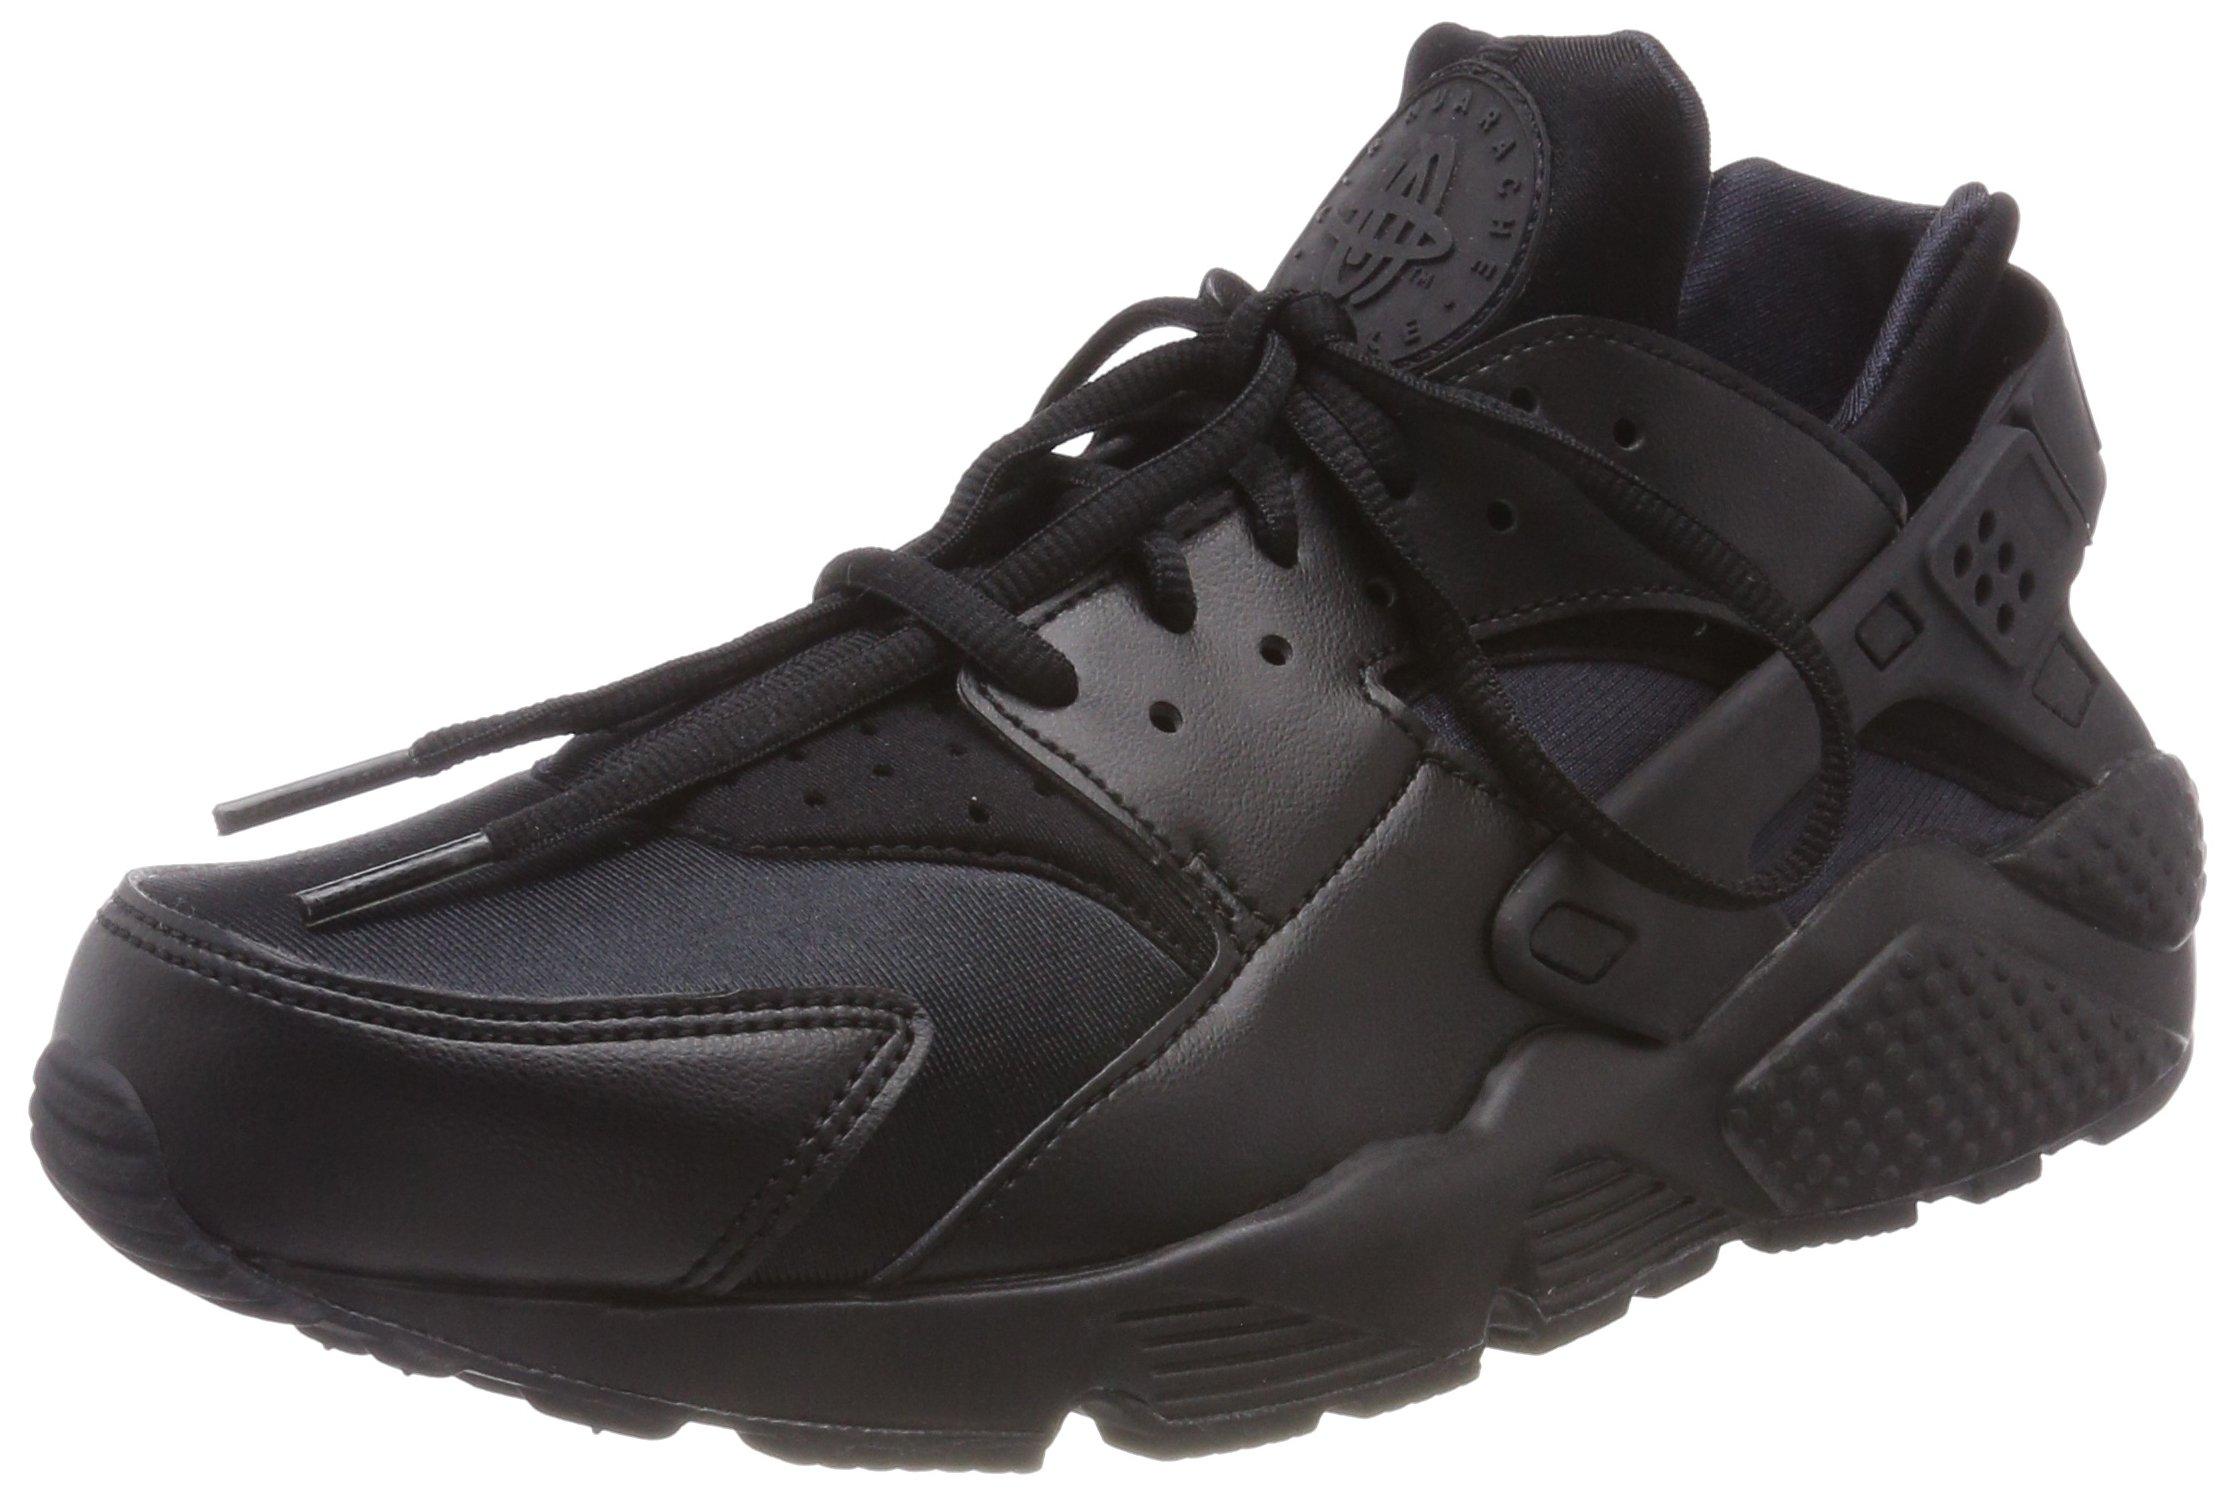 online retailer 05172 6634e Galleon - Nike Women s Air Huarache Run Running Shoe 11.5 Black